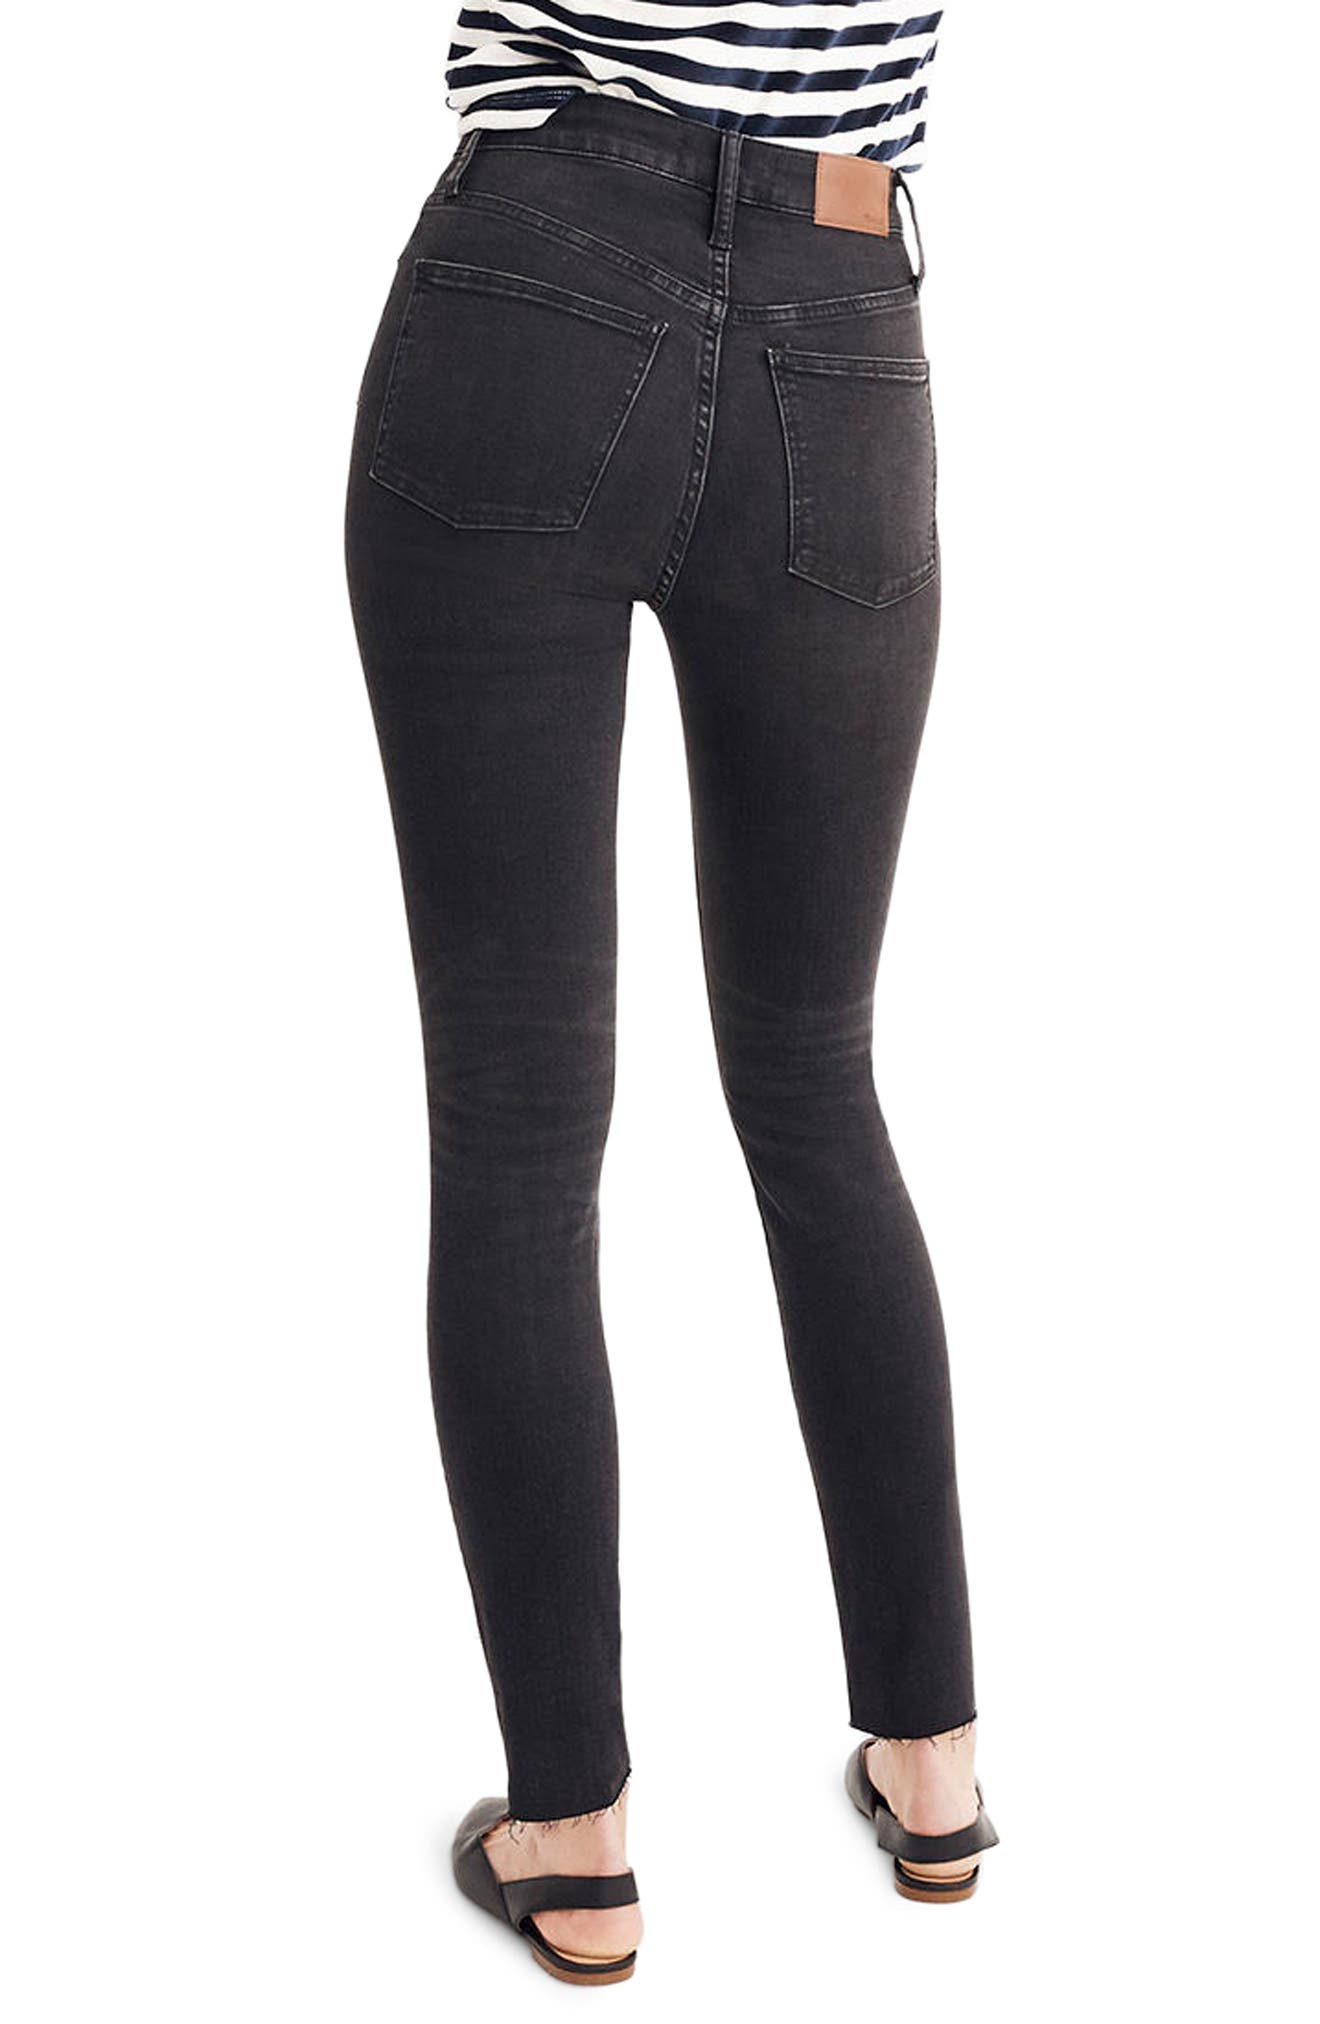 Curvy High Waist Skinny Jeans,                             Alternate thumbnail 3, color,                             BLACK SEA